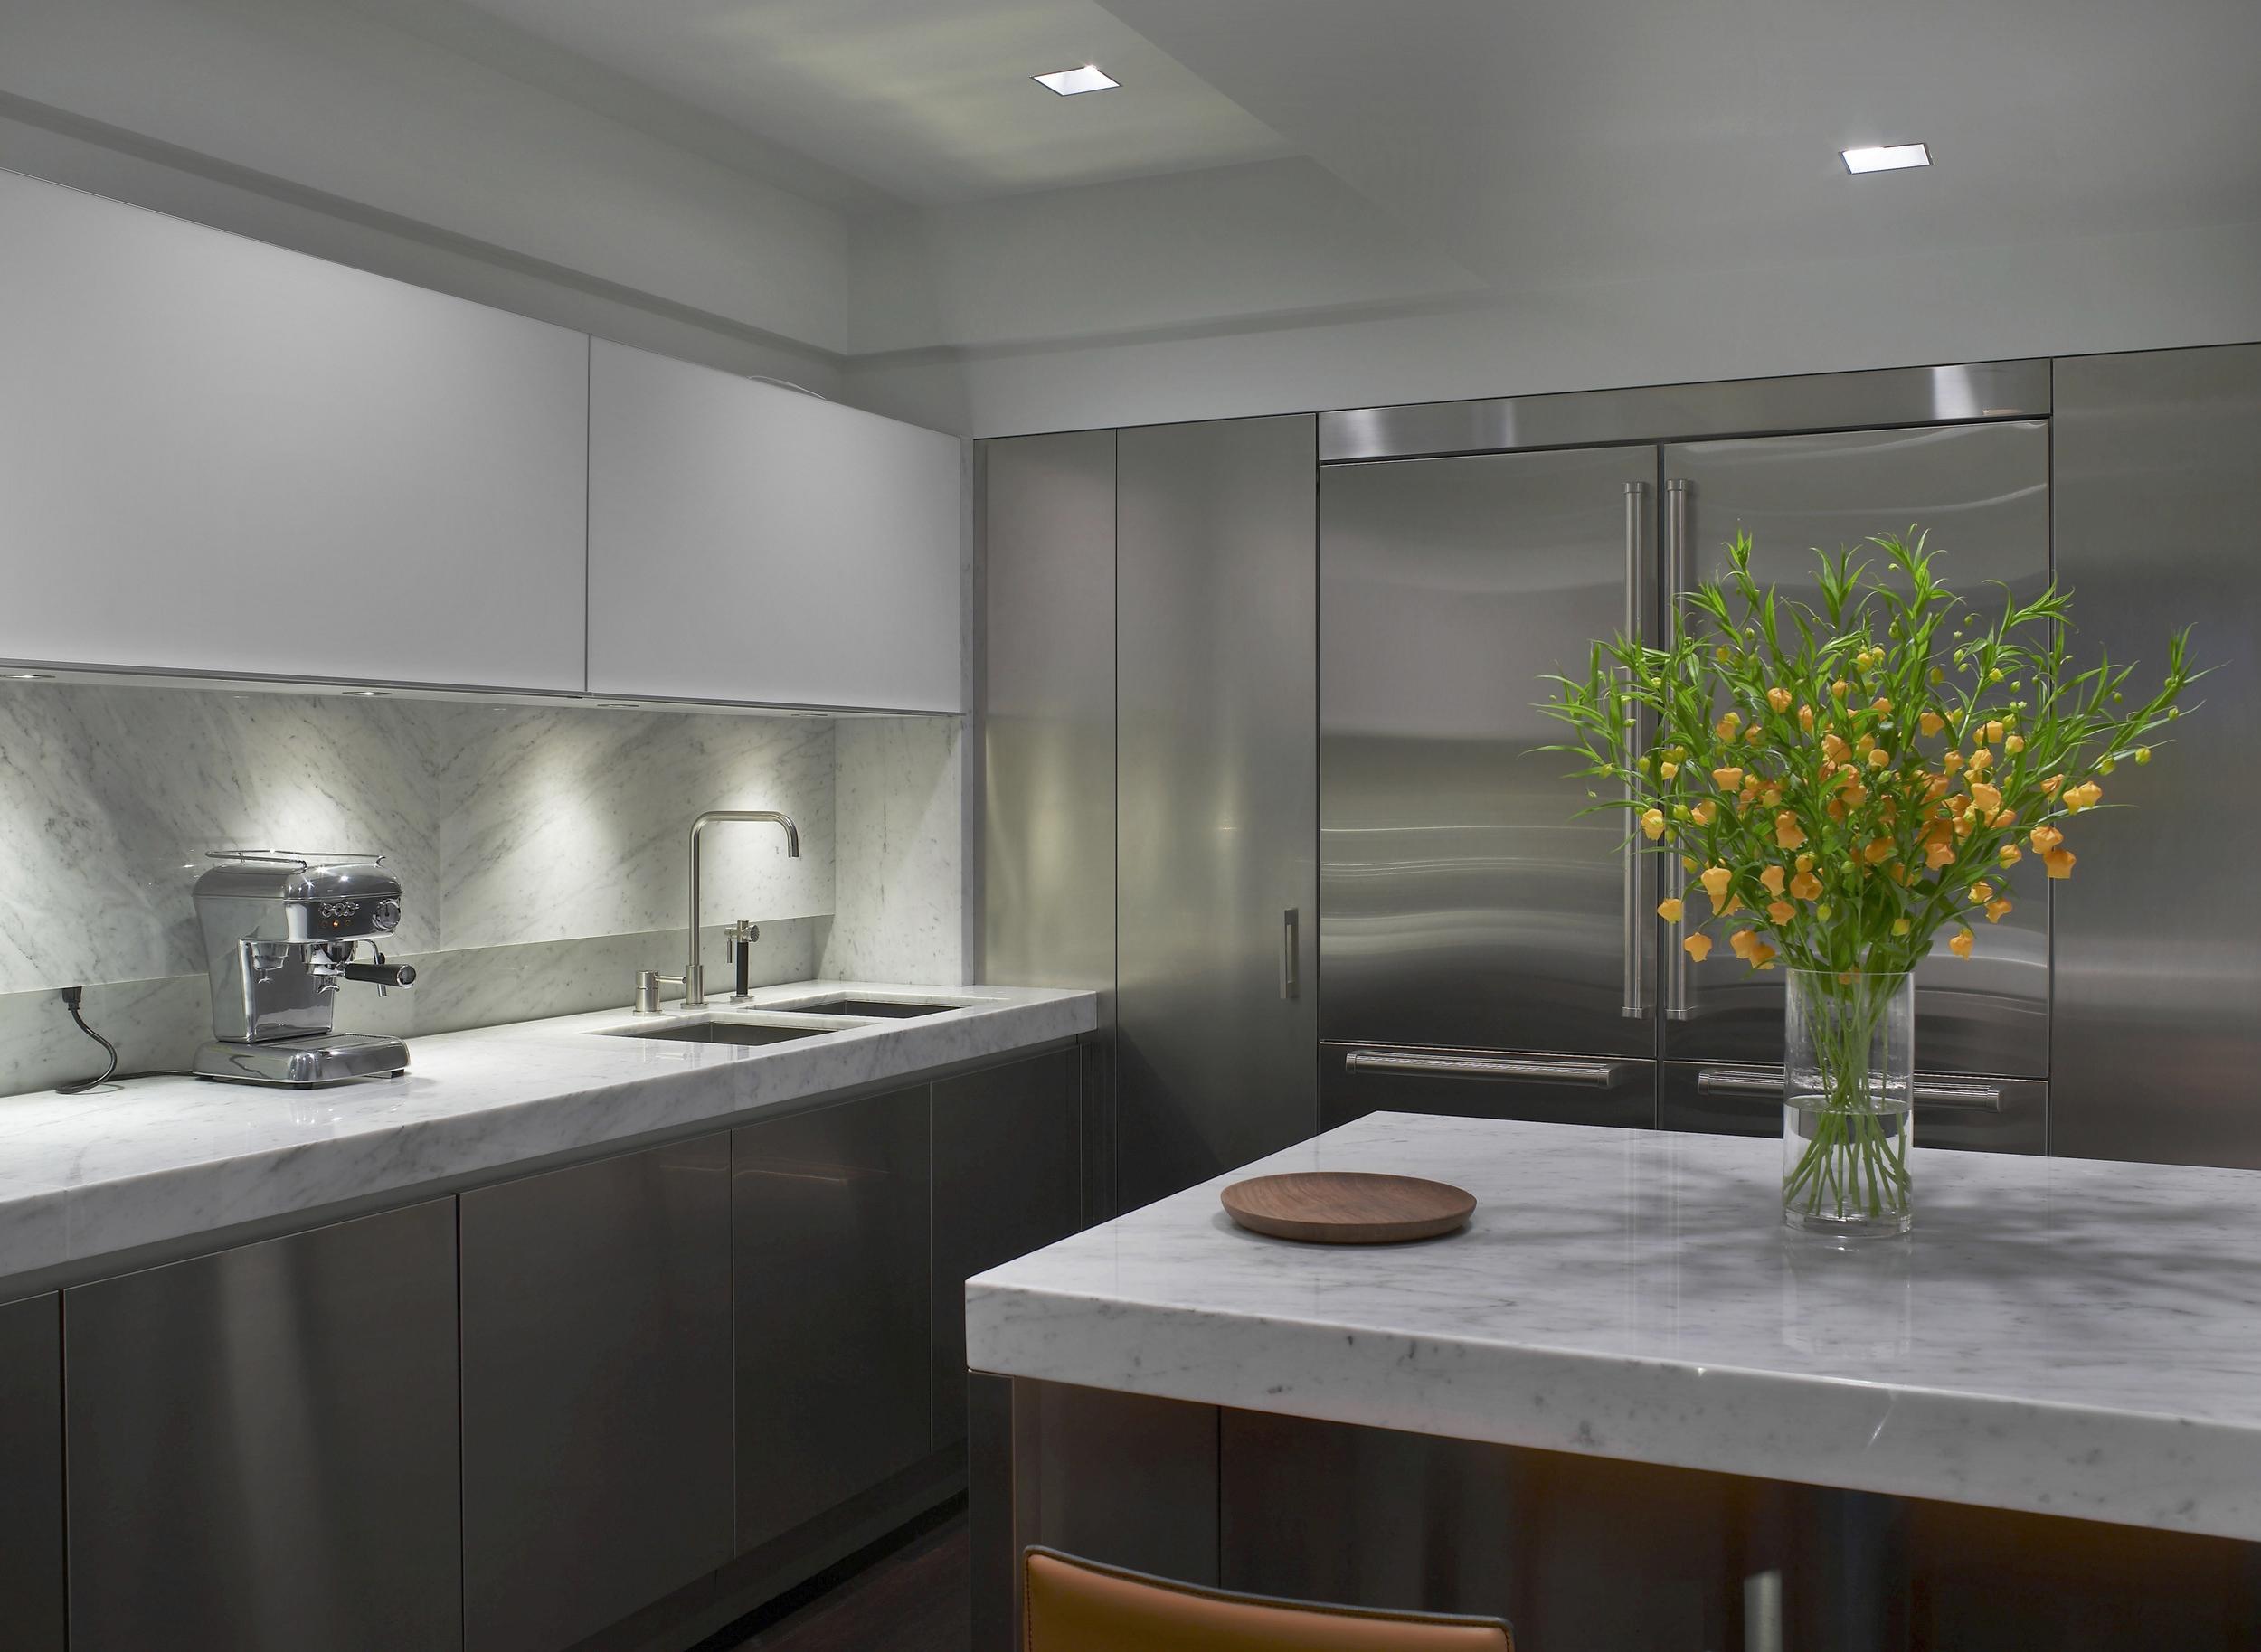 Chambers Apartment Kitchen